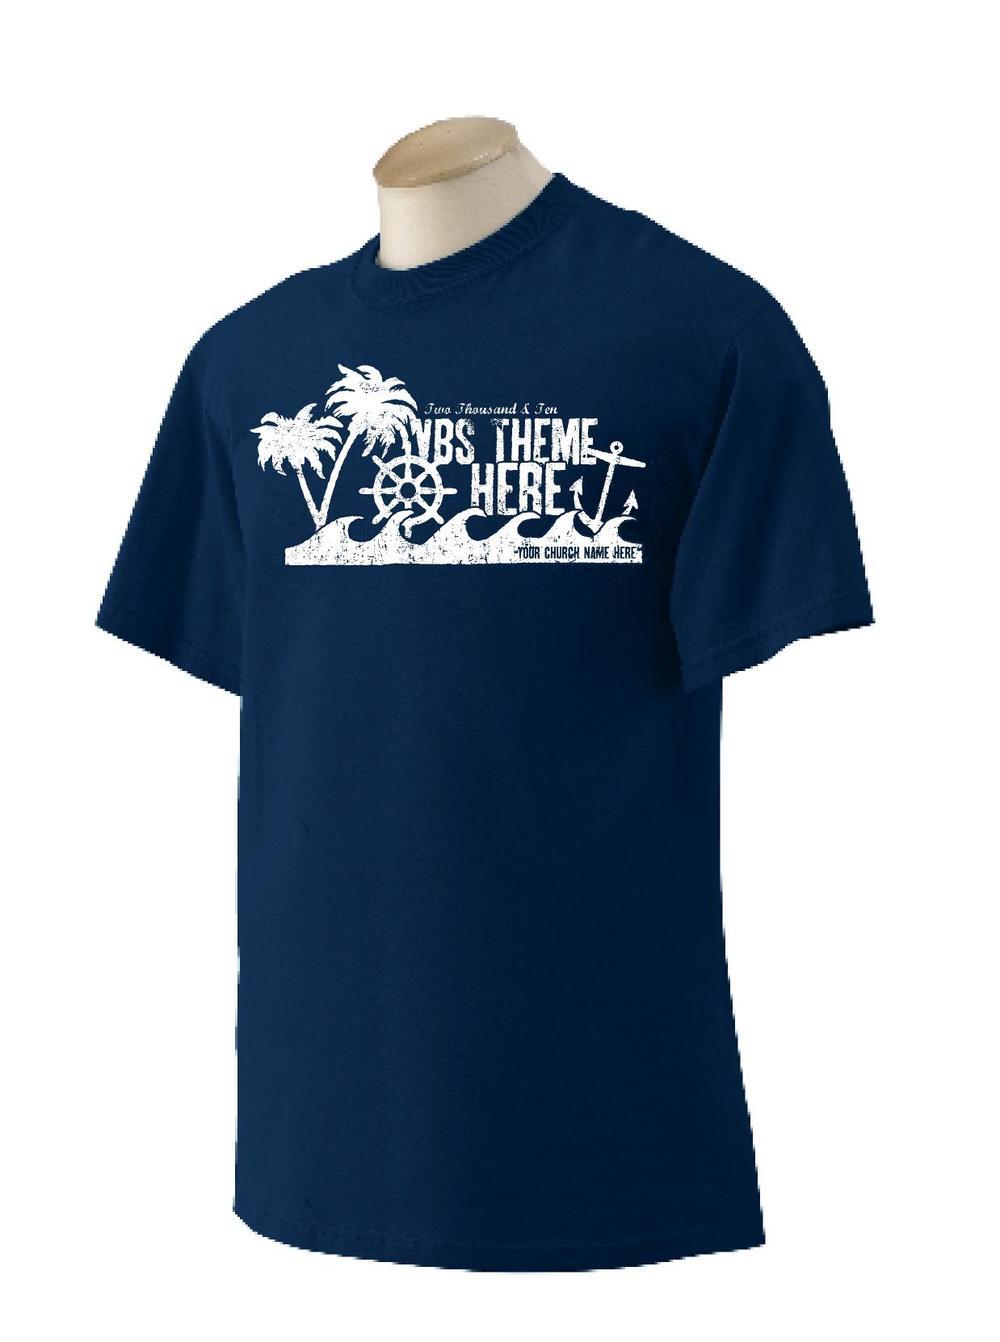 ocean 1 navy shirt.jpg